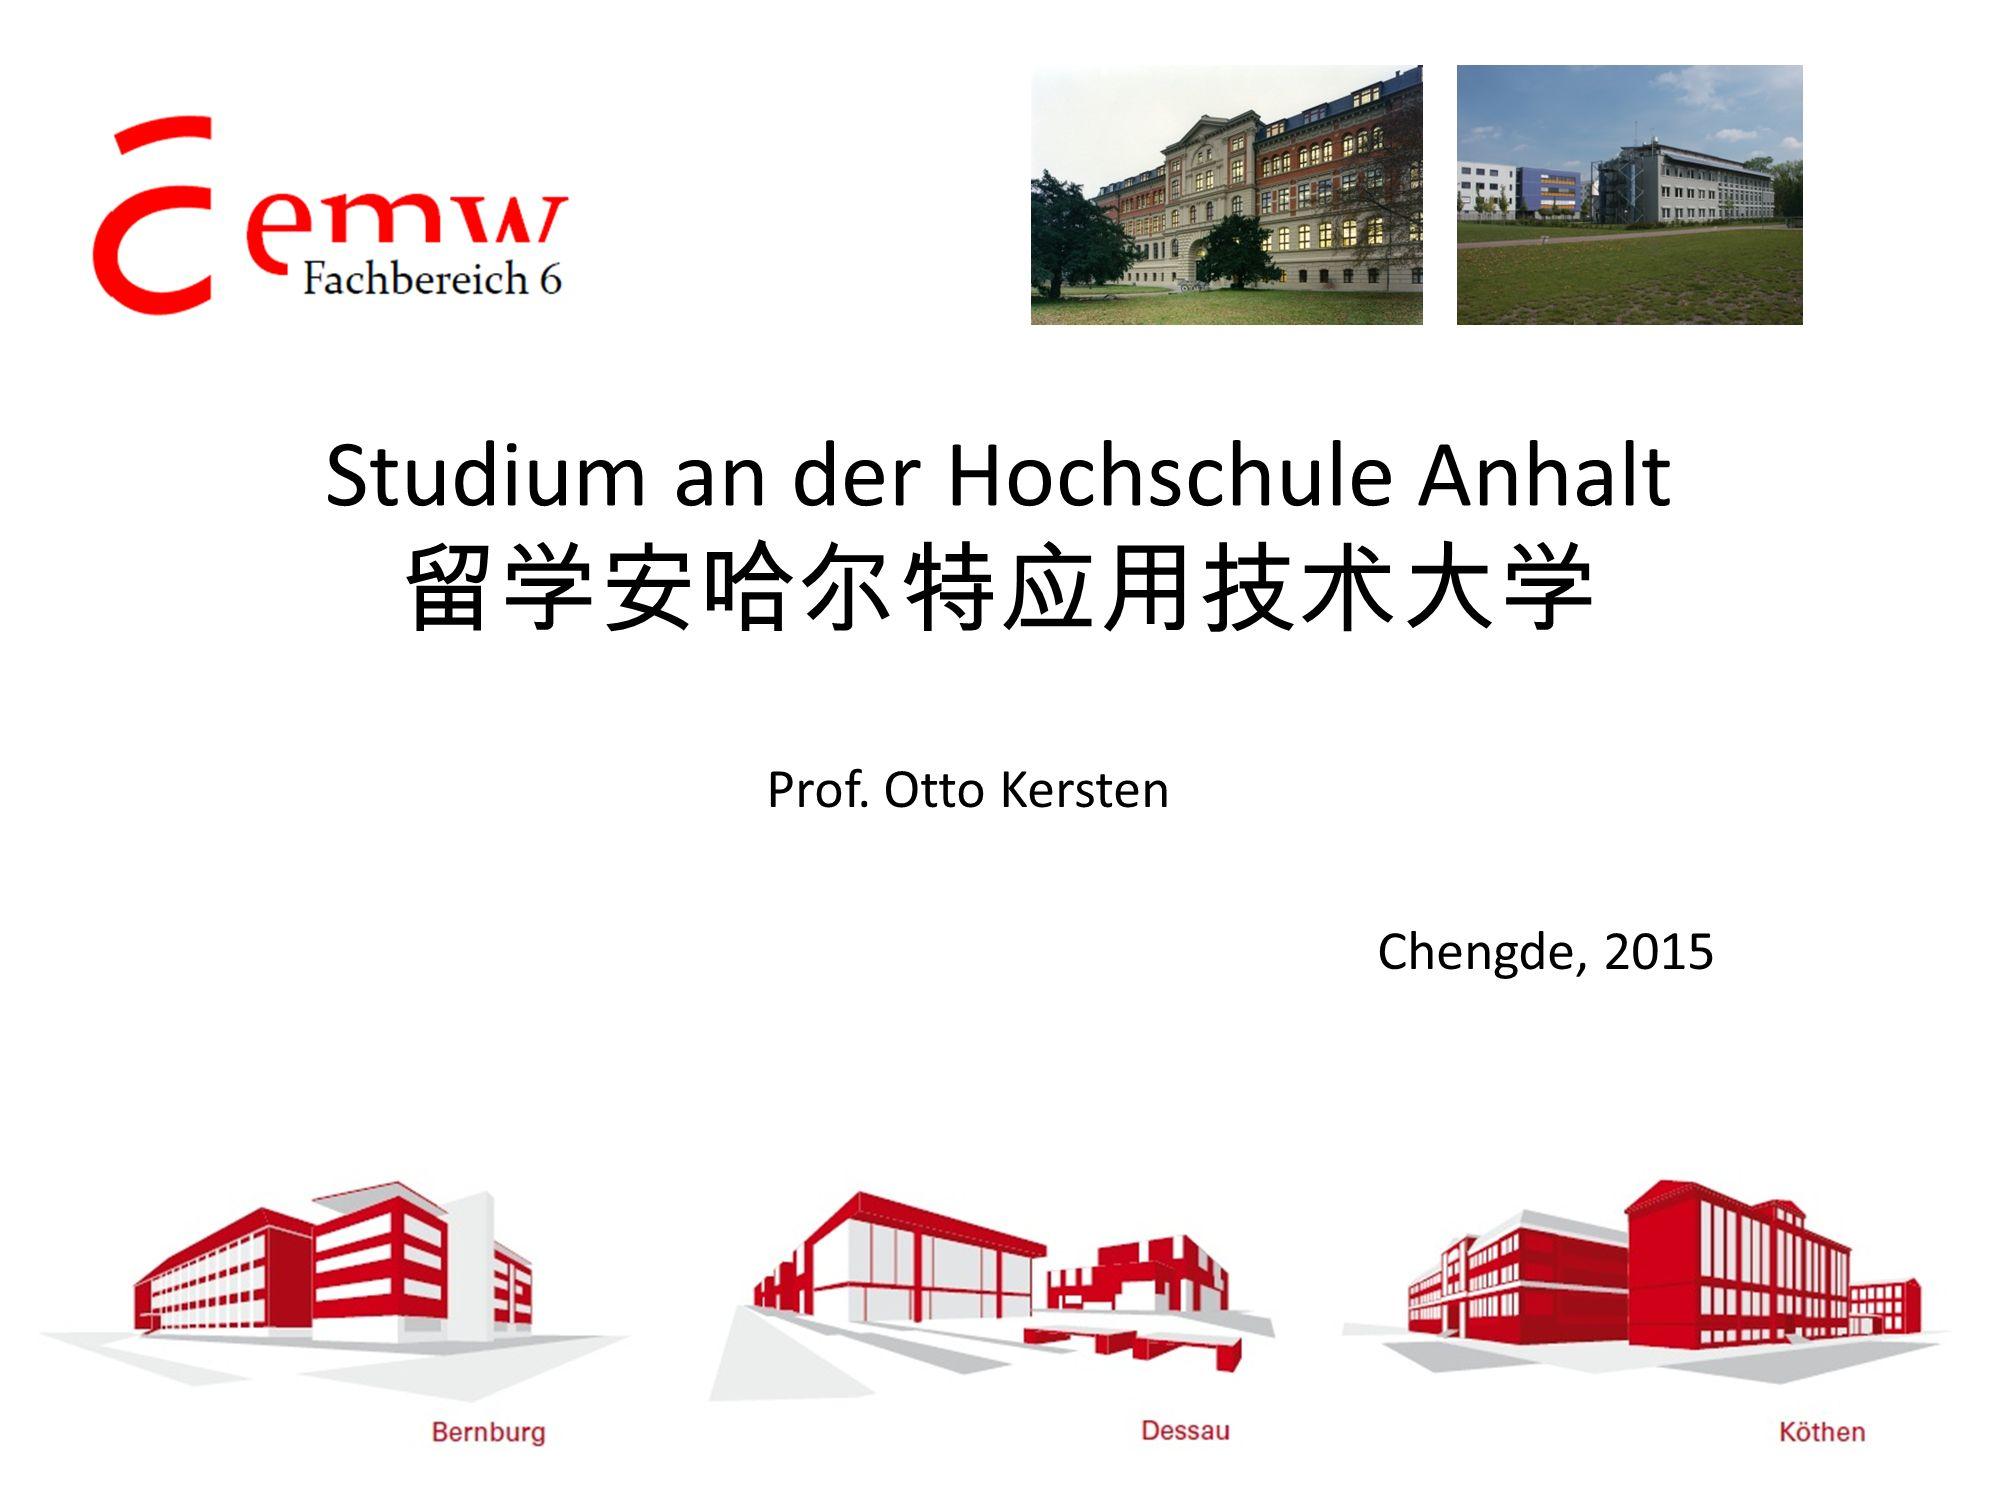 Studium an der Hochschule Anhalt 留学安哈尔特应用技术大学 Prof. Otto Kersten Chengde, 2015